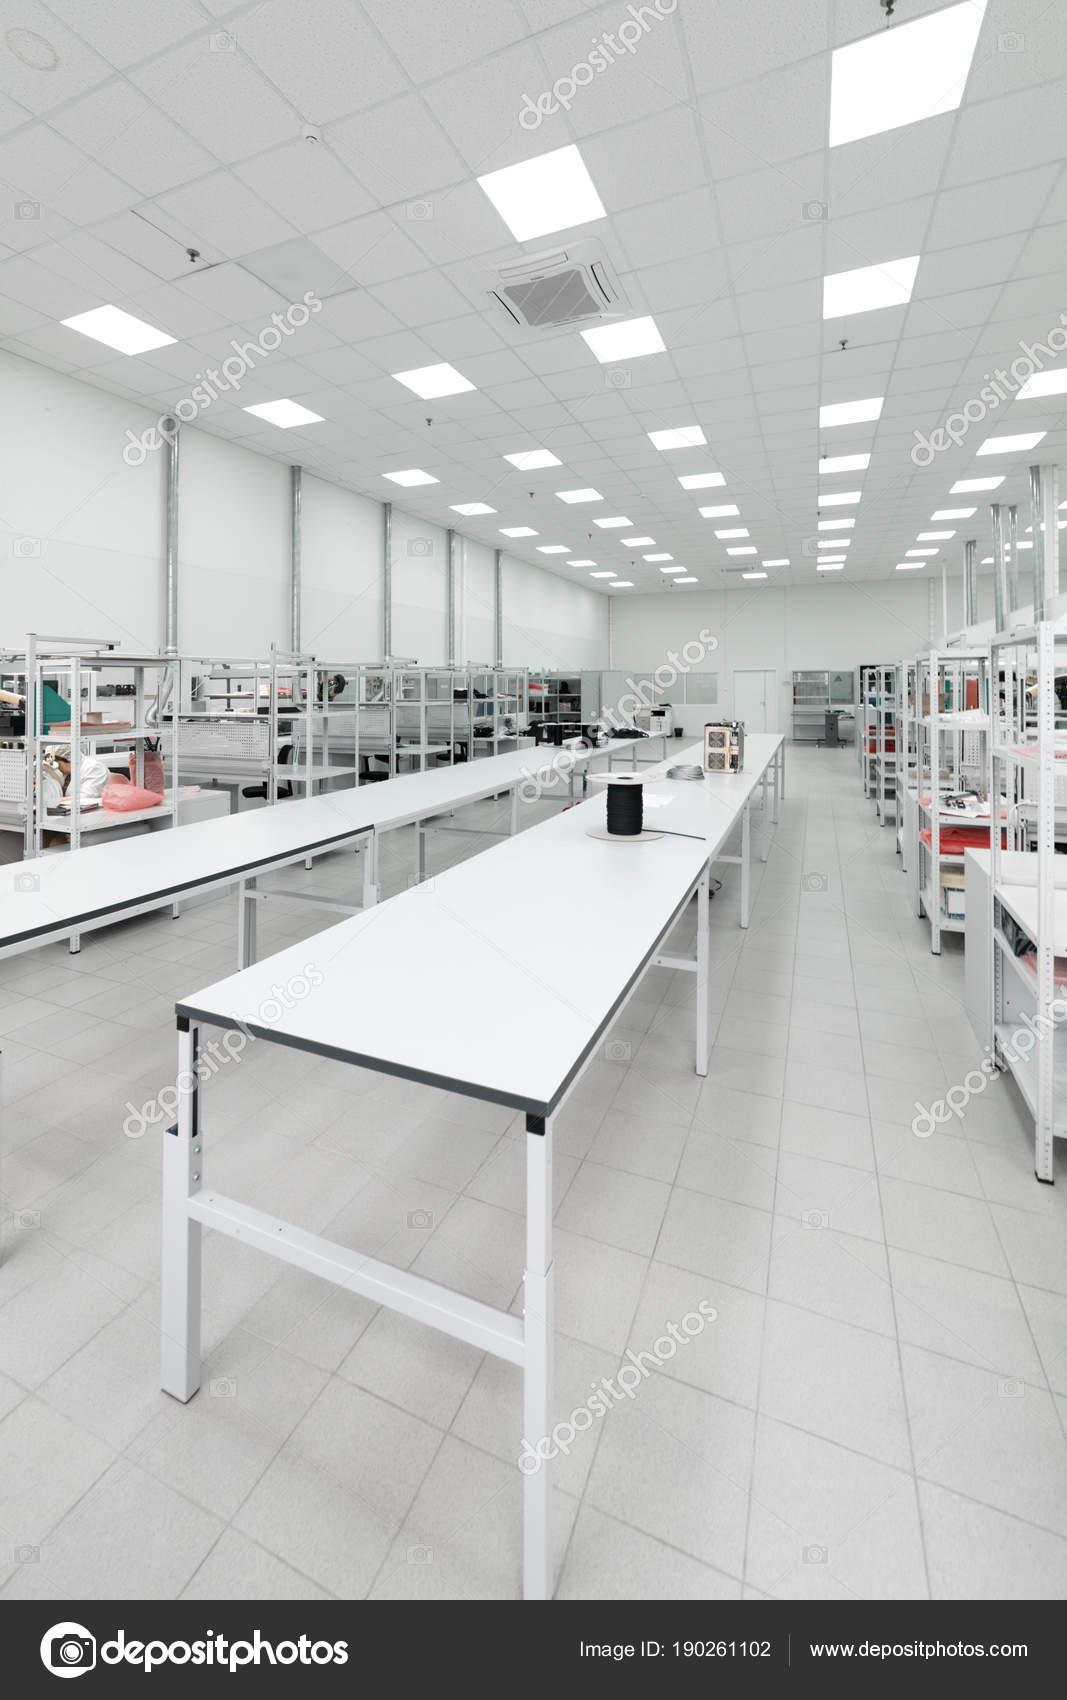 Sala De Produ O Limpa Fabrico De Electr Nica Industrial